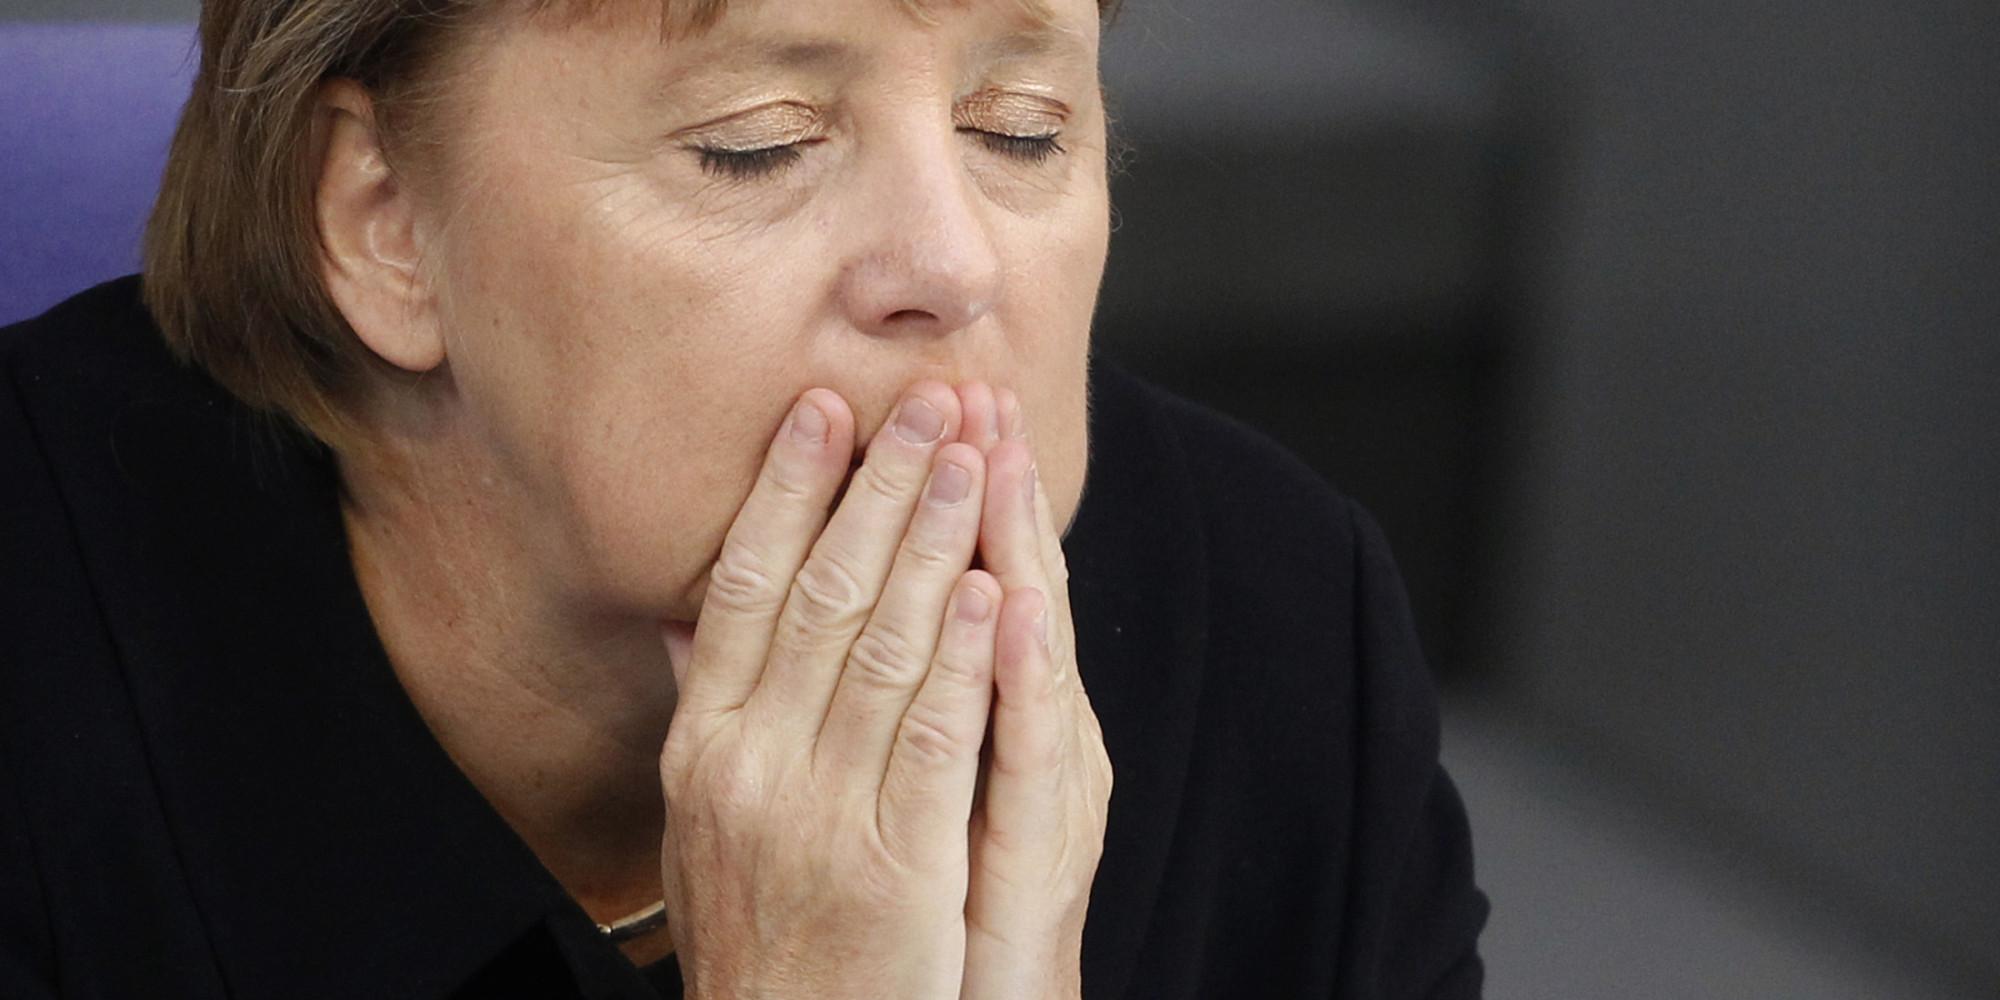 Merkel Fingernägel Bilder